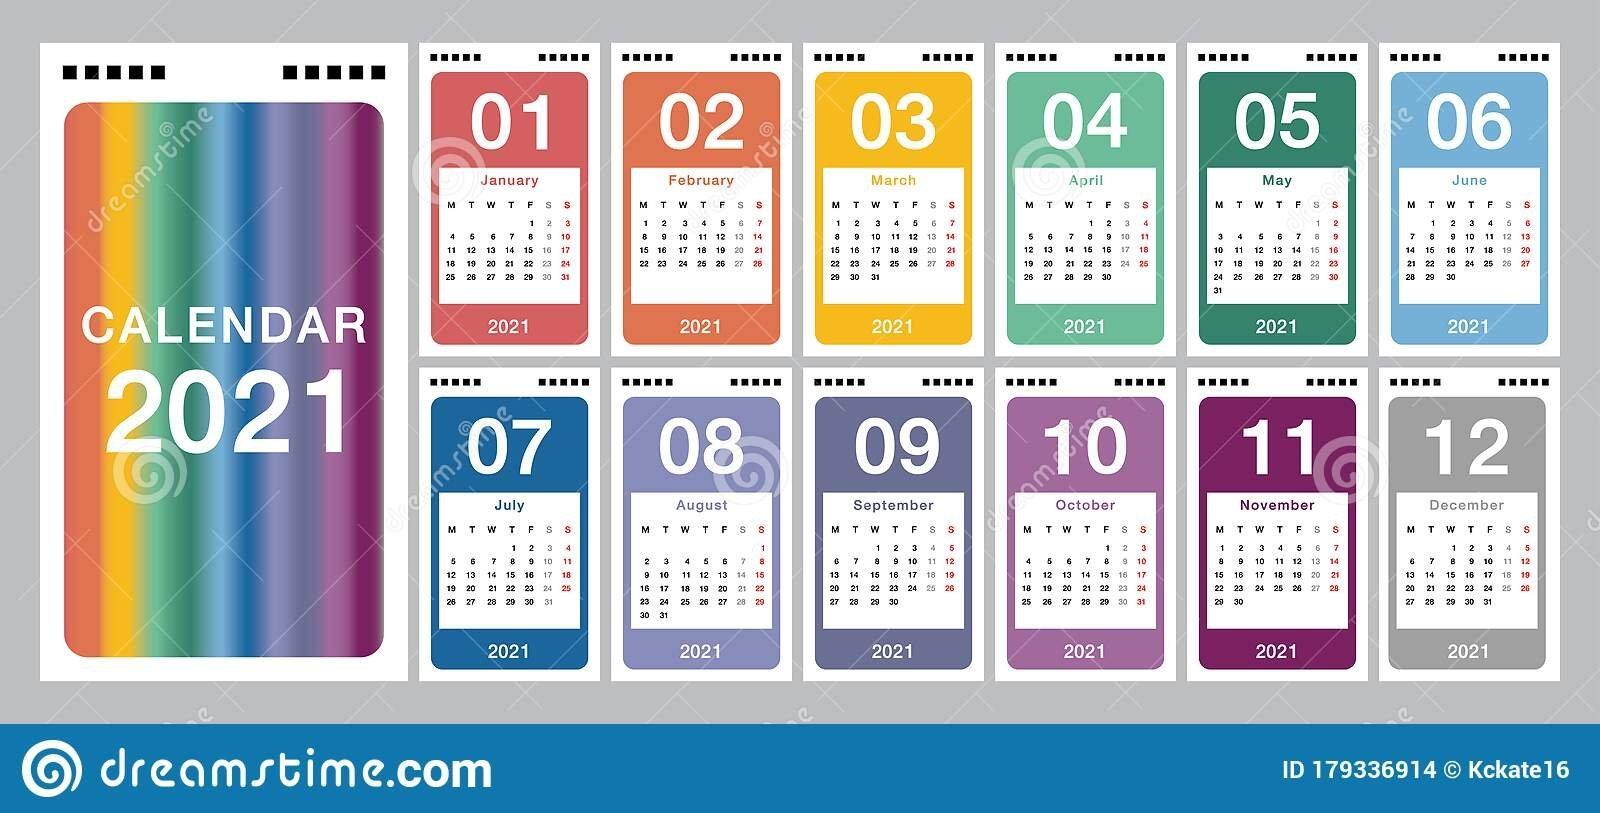 Colorful Year 2021 Calendar Vector Design Template, Simple And Clean Design. Calendar For 2021 in Calendar 2021 Design In Illustrator